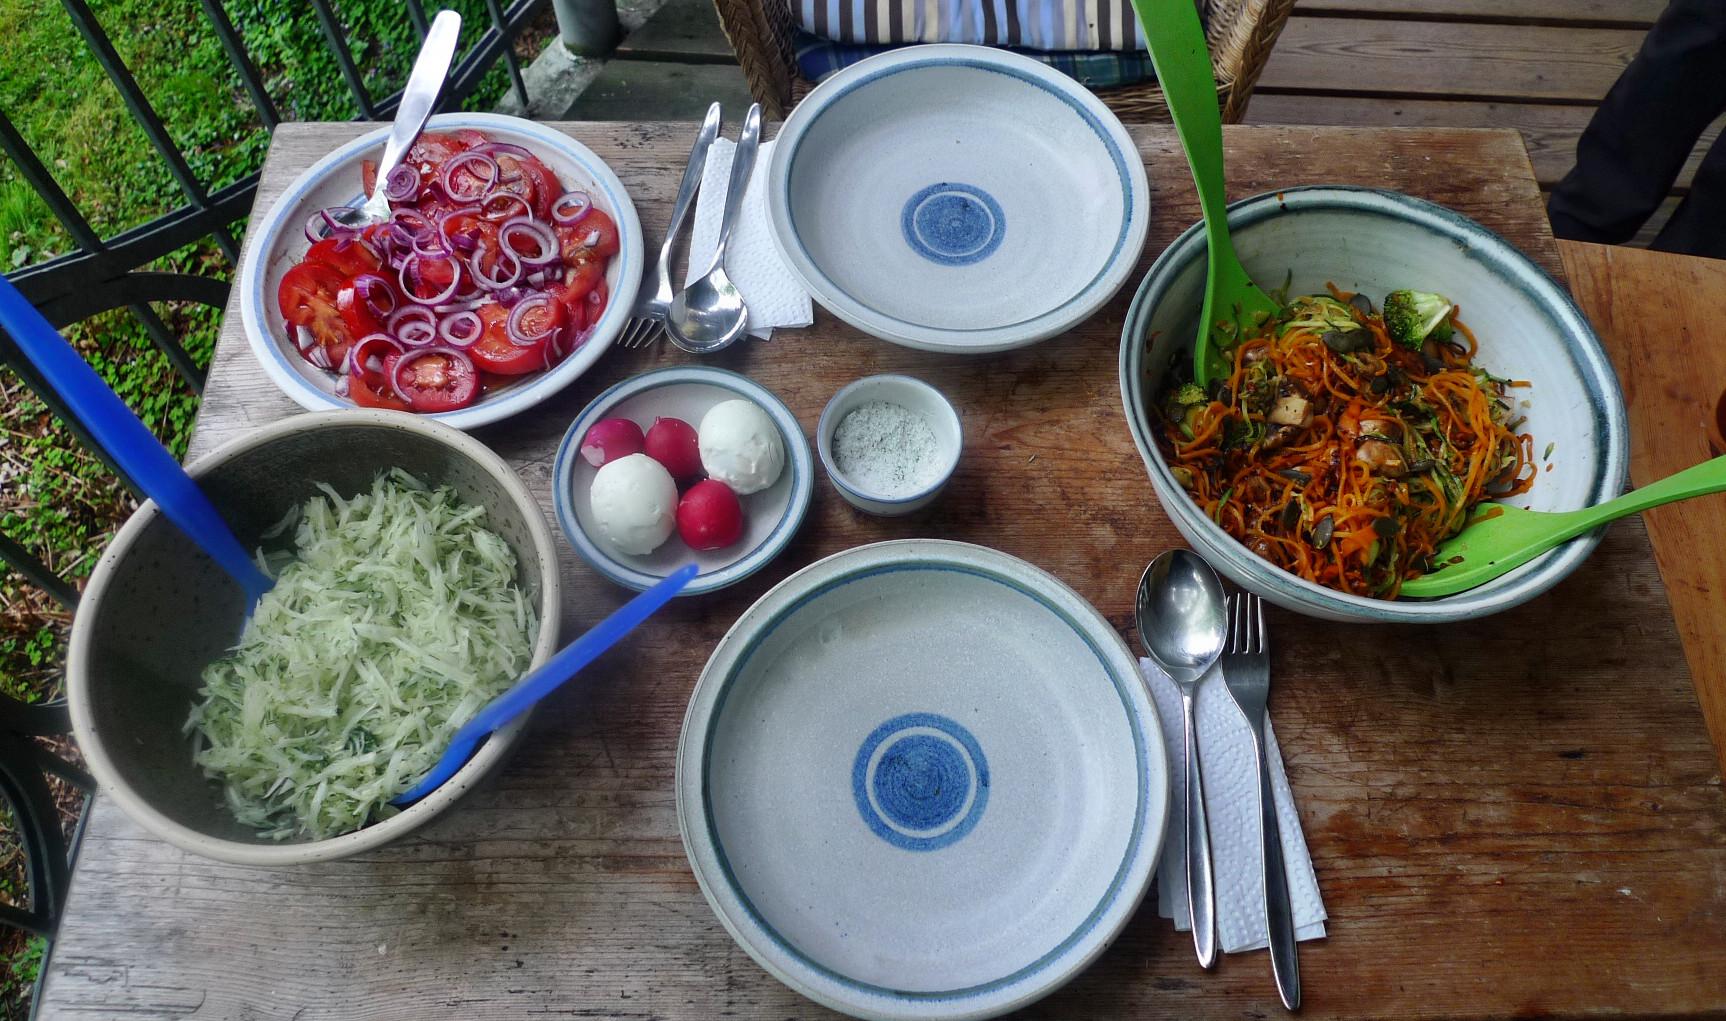 Gemüsespaghetti mit Champignon,Kohlrabisalat,Tomatensalat,vegan -5.5.15   (9)